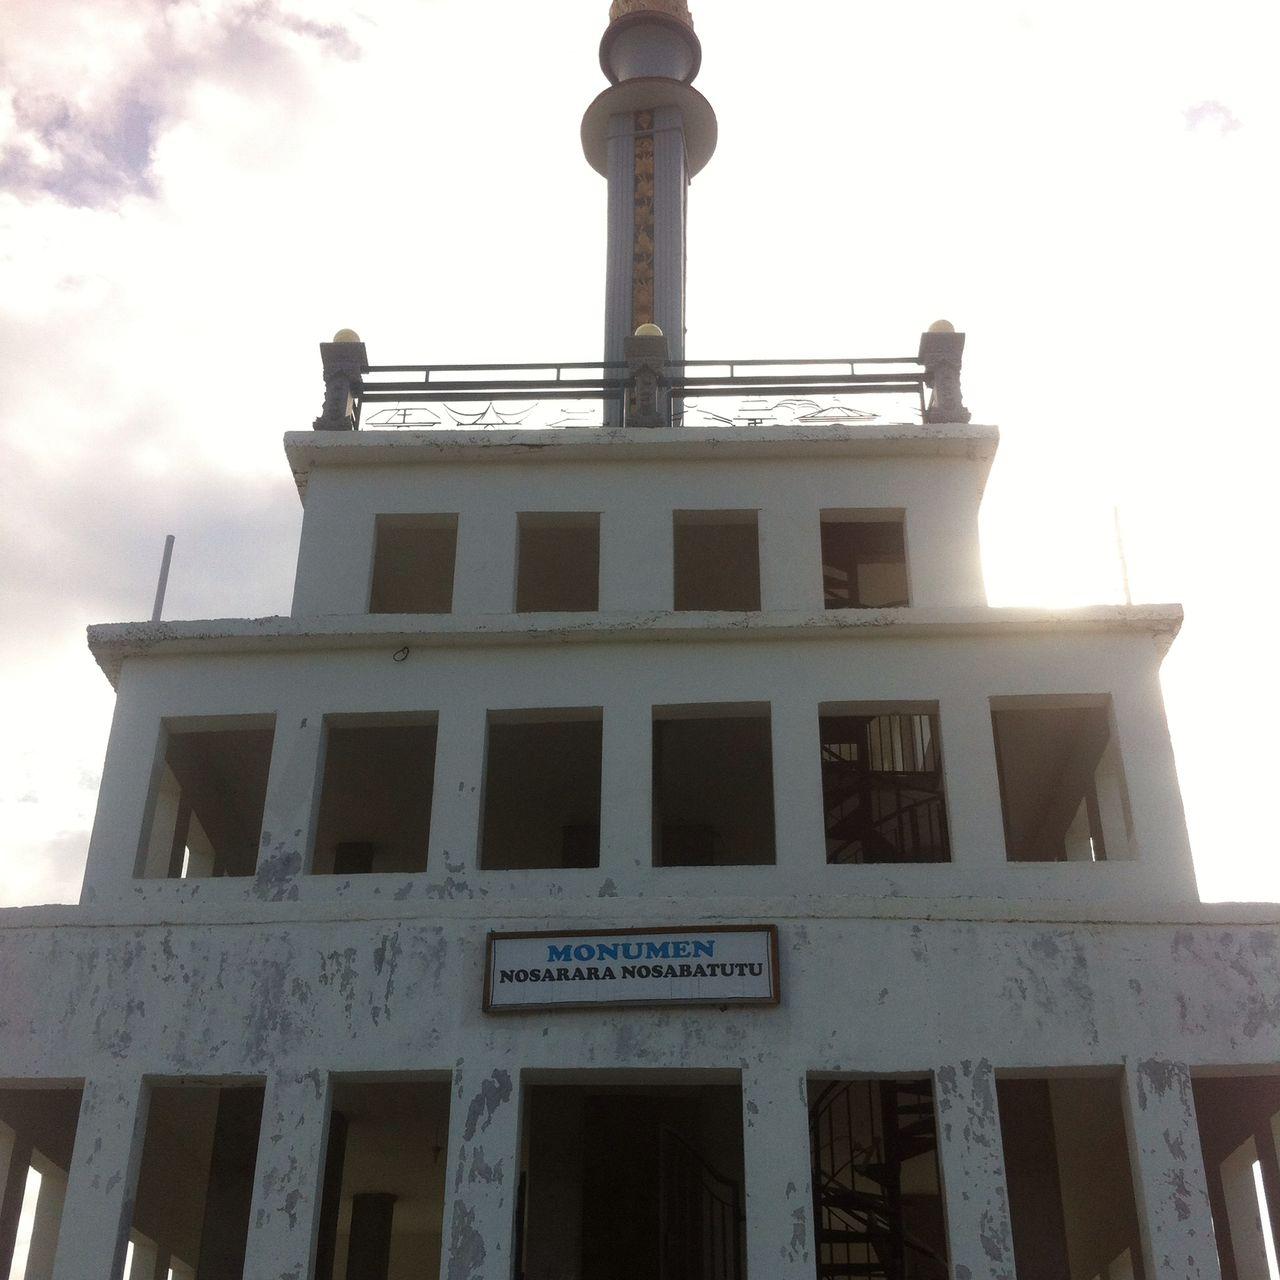 Taman Edukasi Monumen Perdamaian Nosarara Nosabatutu Palu 4 Tugu Kota